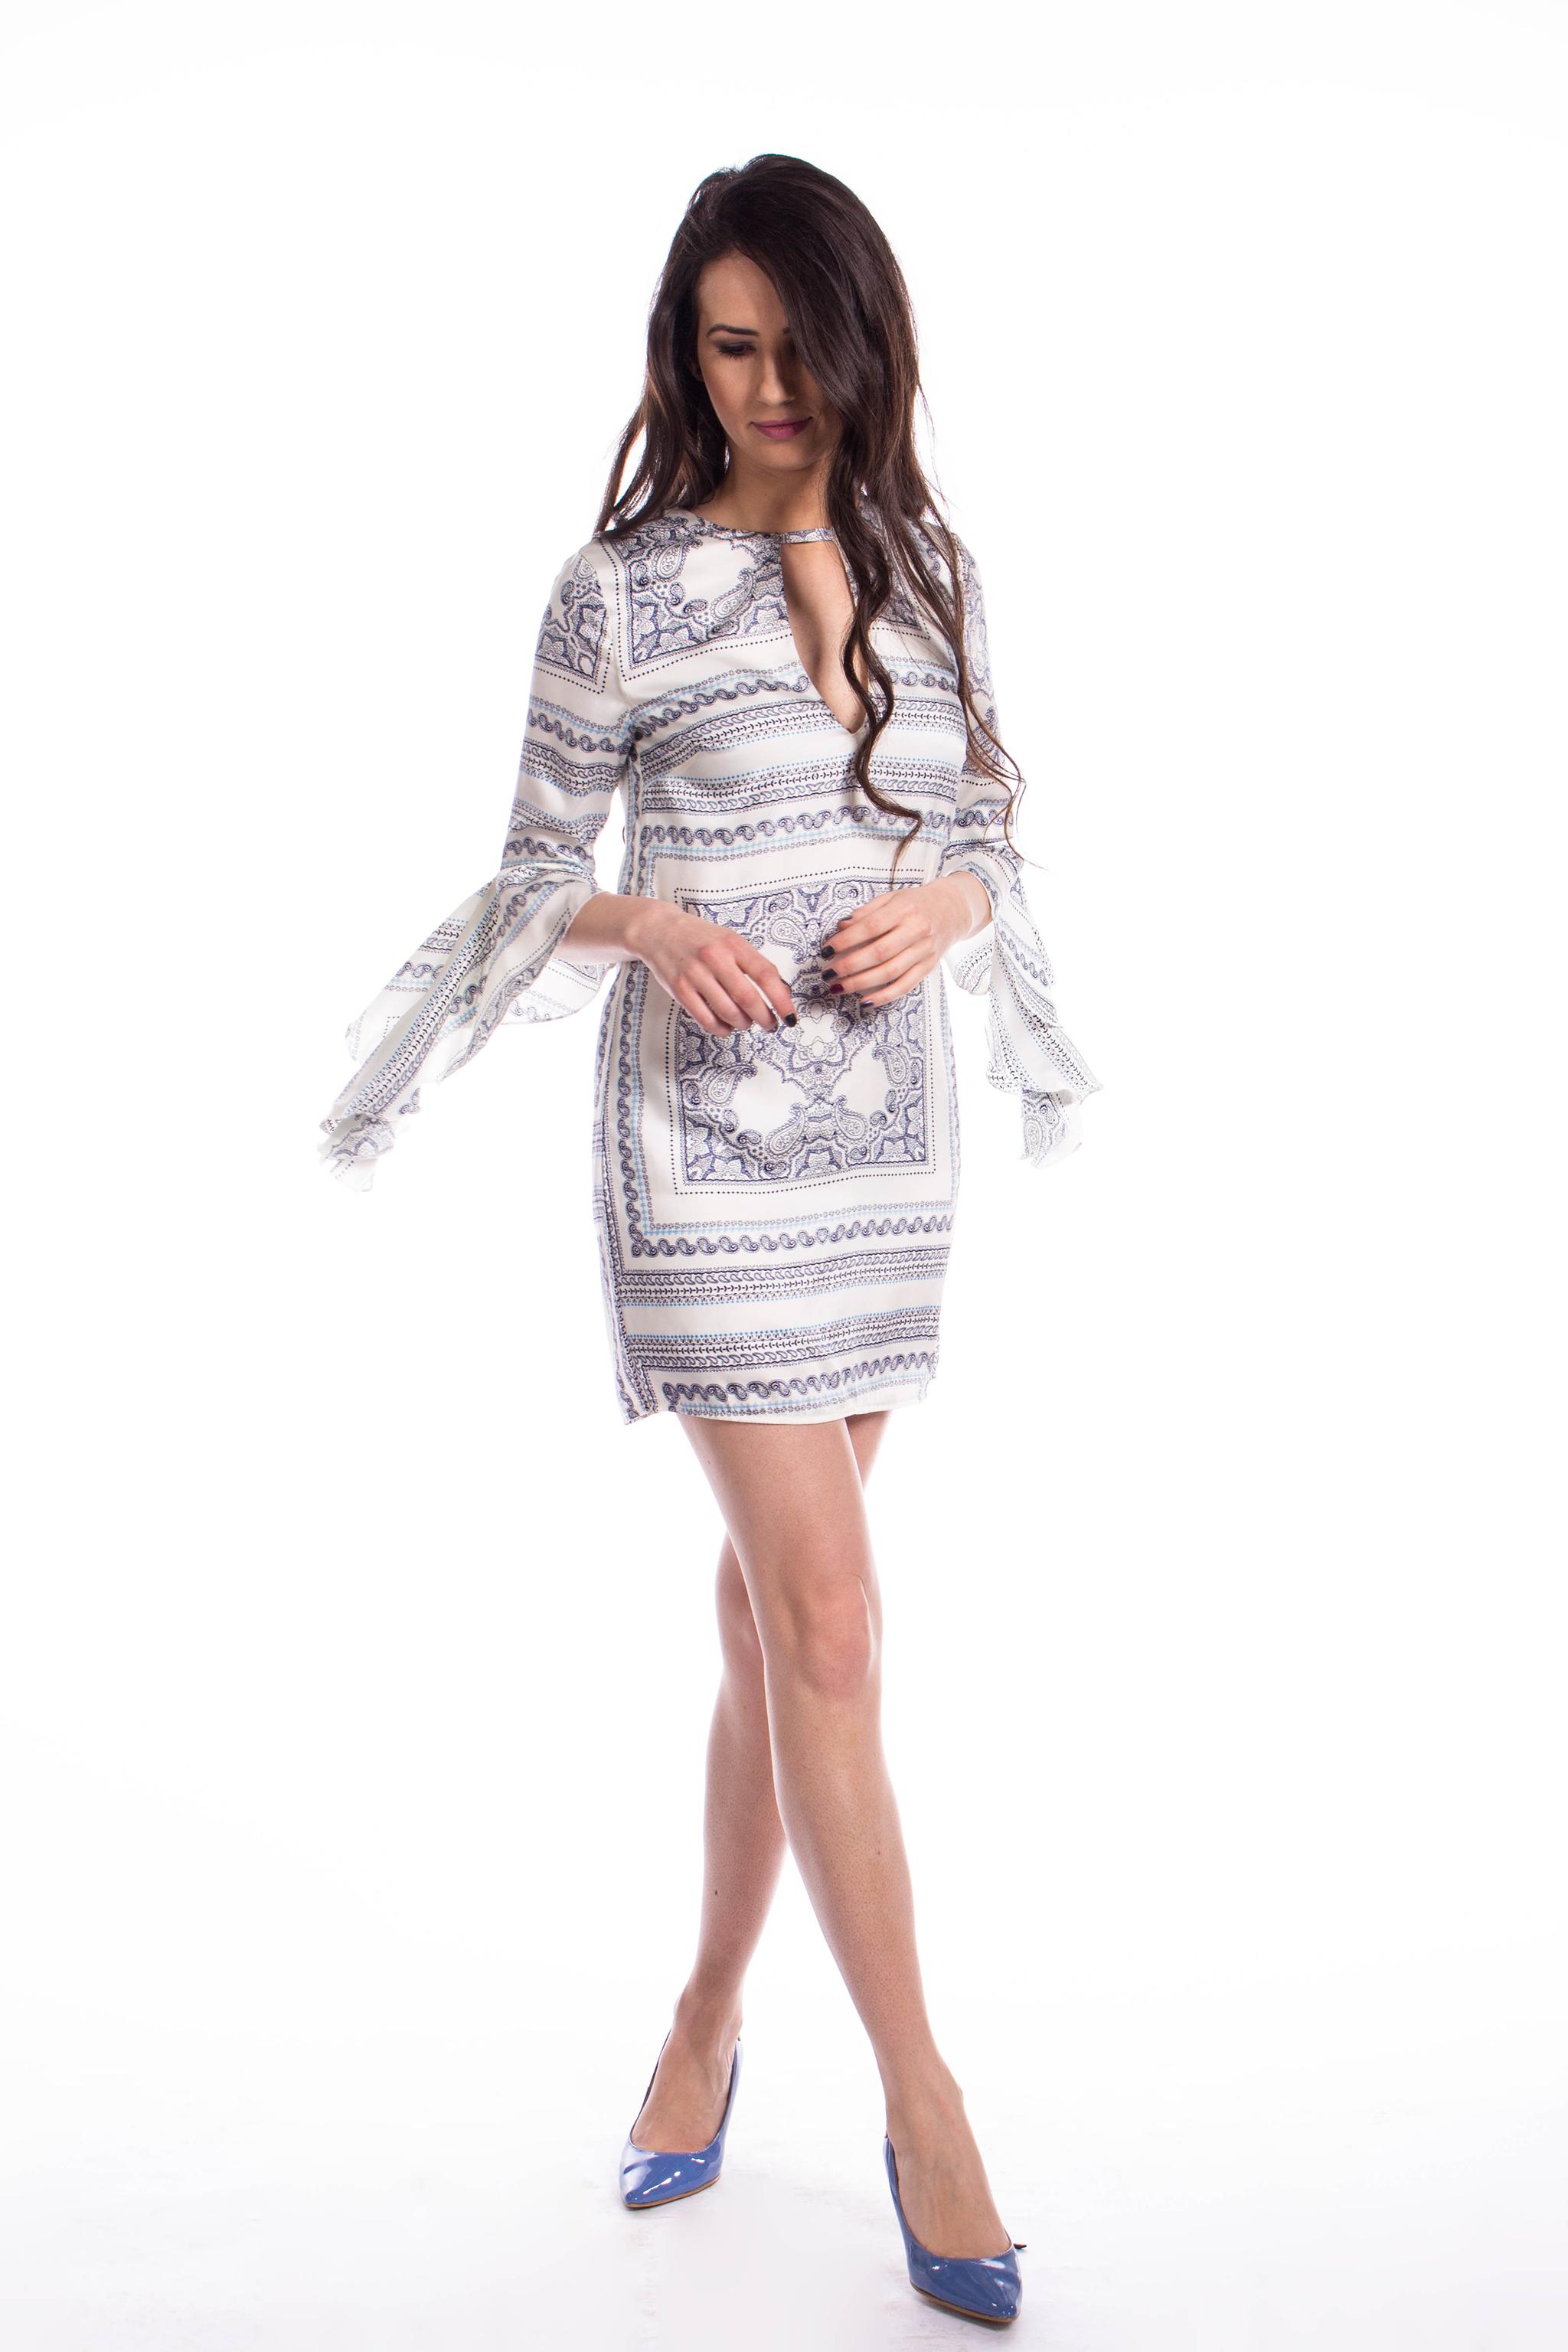 obrázok 5 Missguided šaty s volánovým rukávom 154c85aaf2c